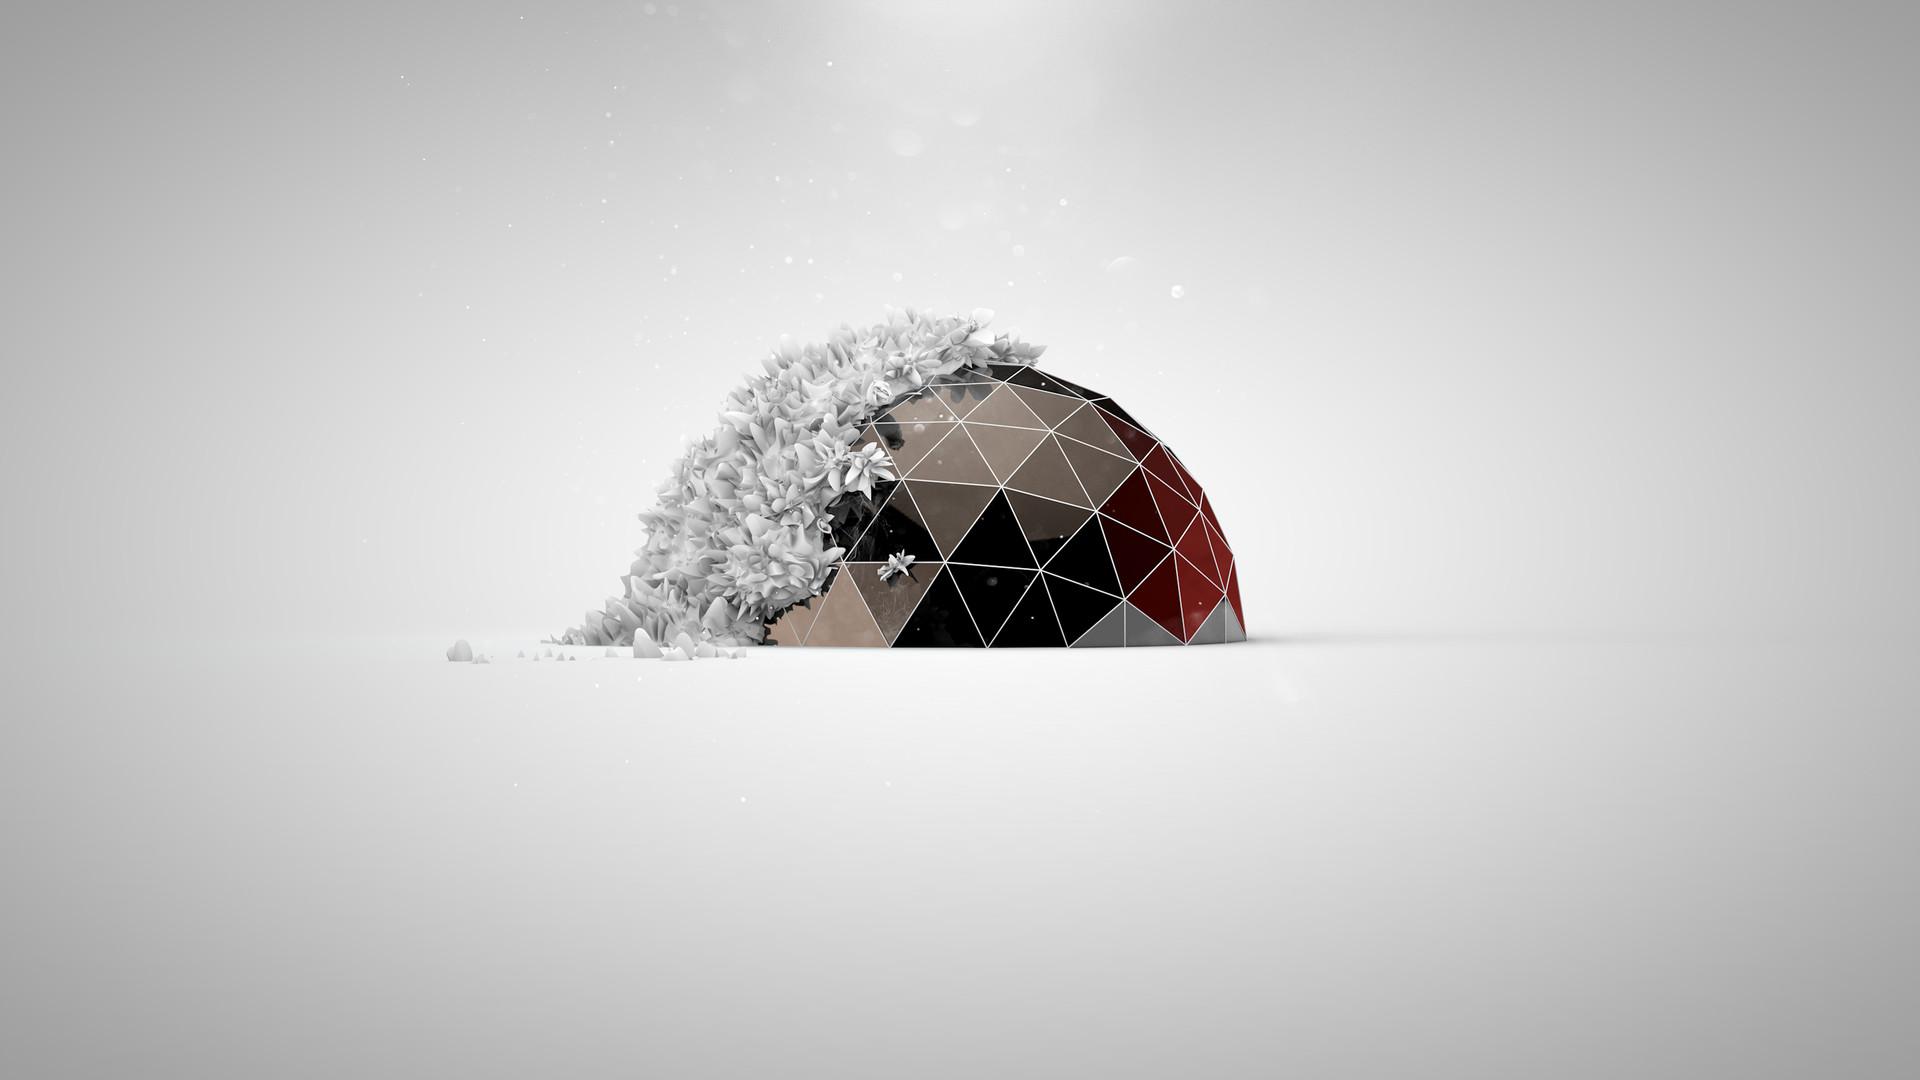 Dmitry uralov frozen thing